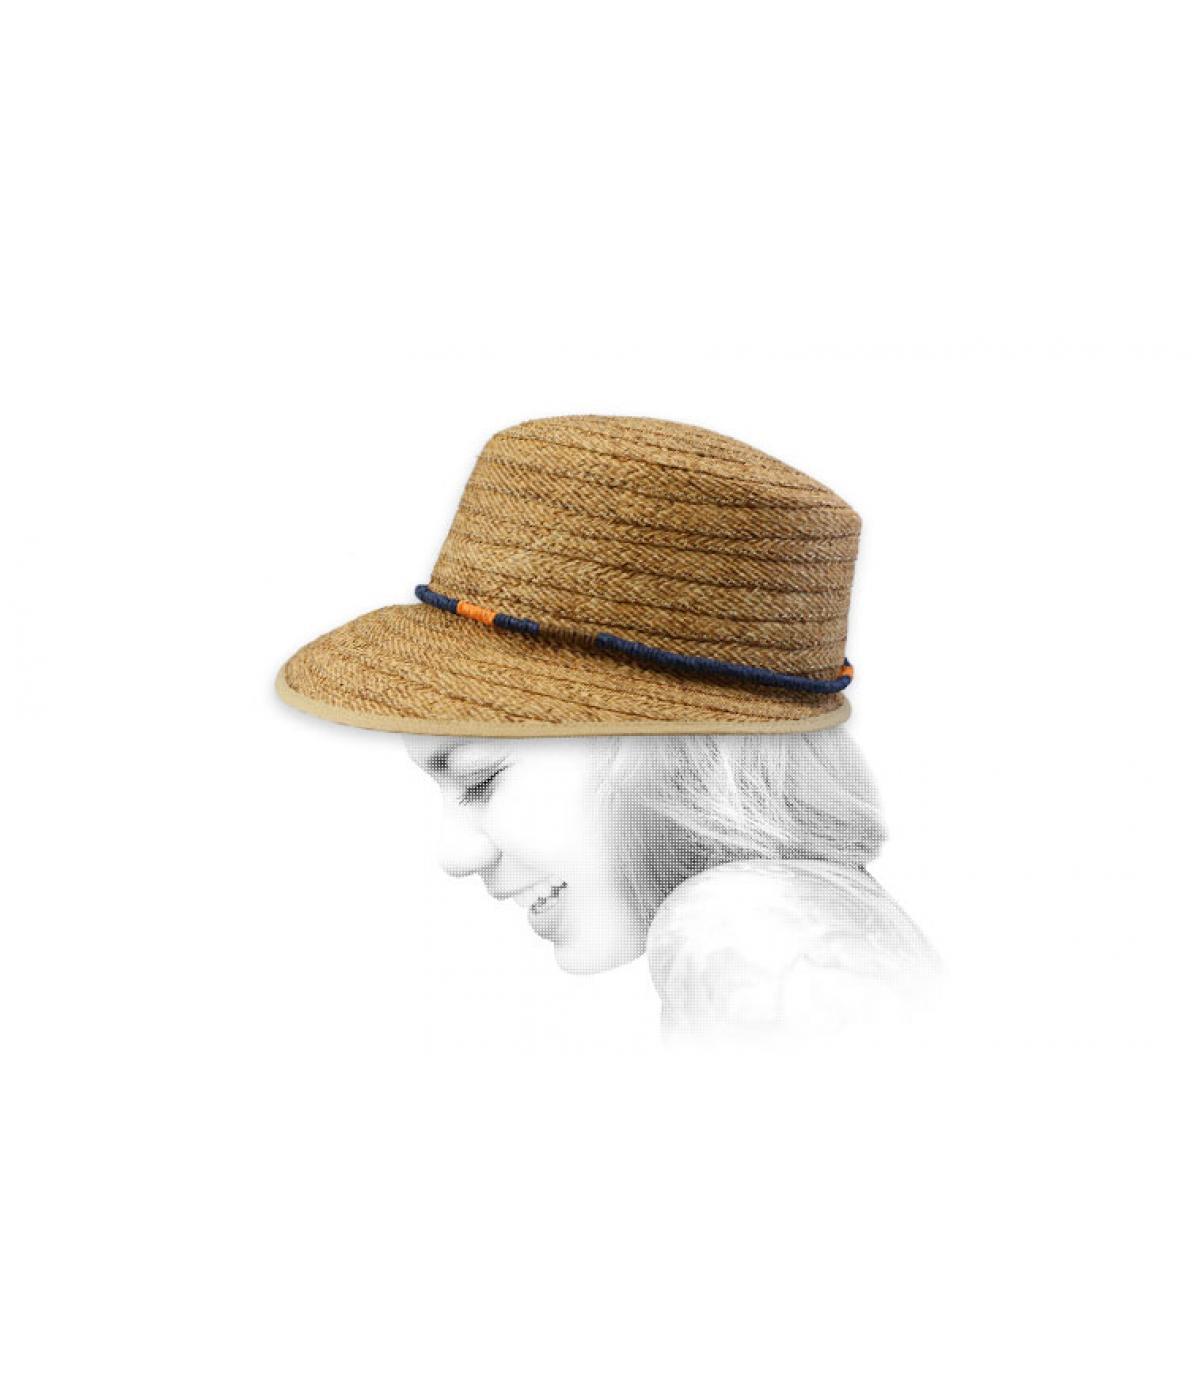 sombrero visera paja